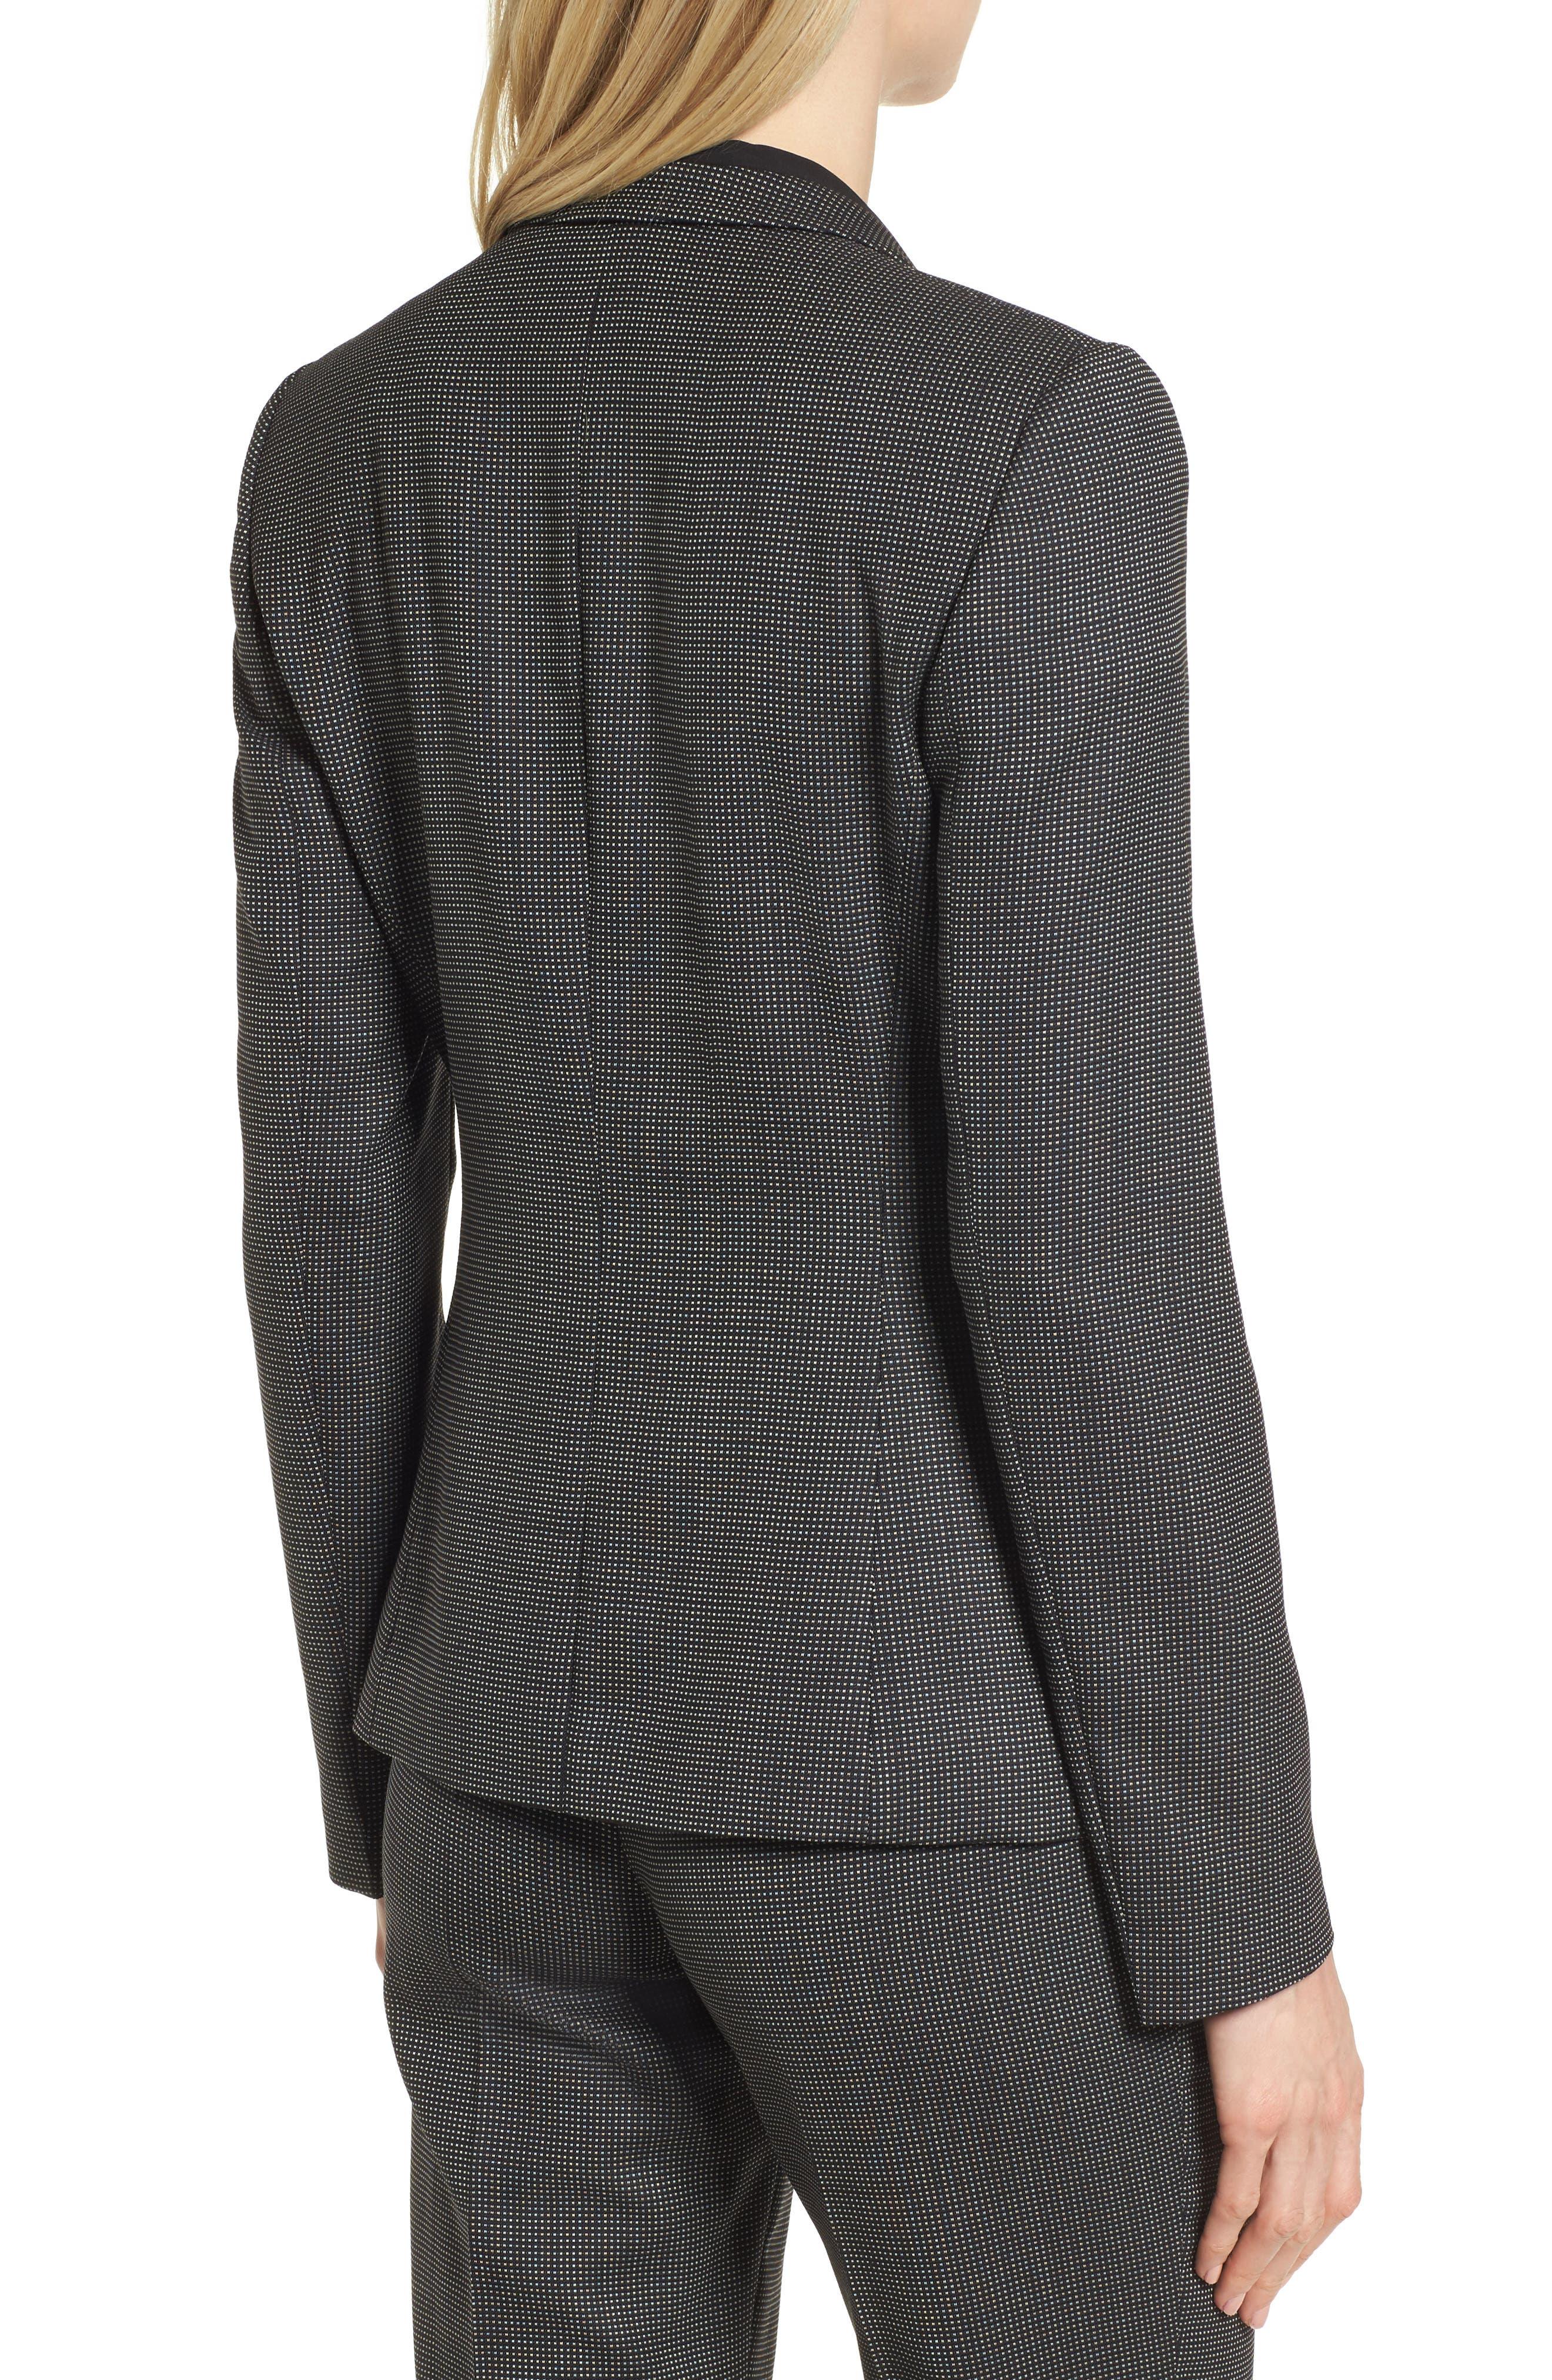 Jeresa Check Stretch Wool Suit Jacket,                             Alternate thumbnail 2, color,                             Black Fantasy